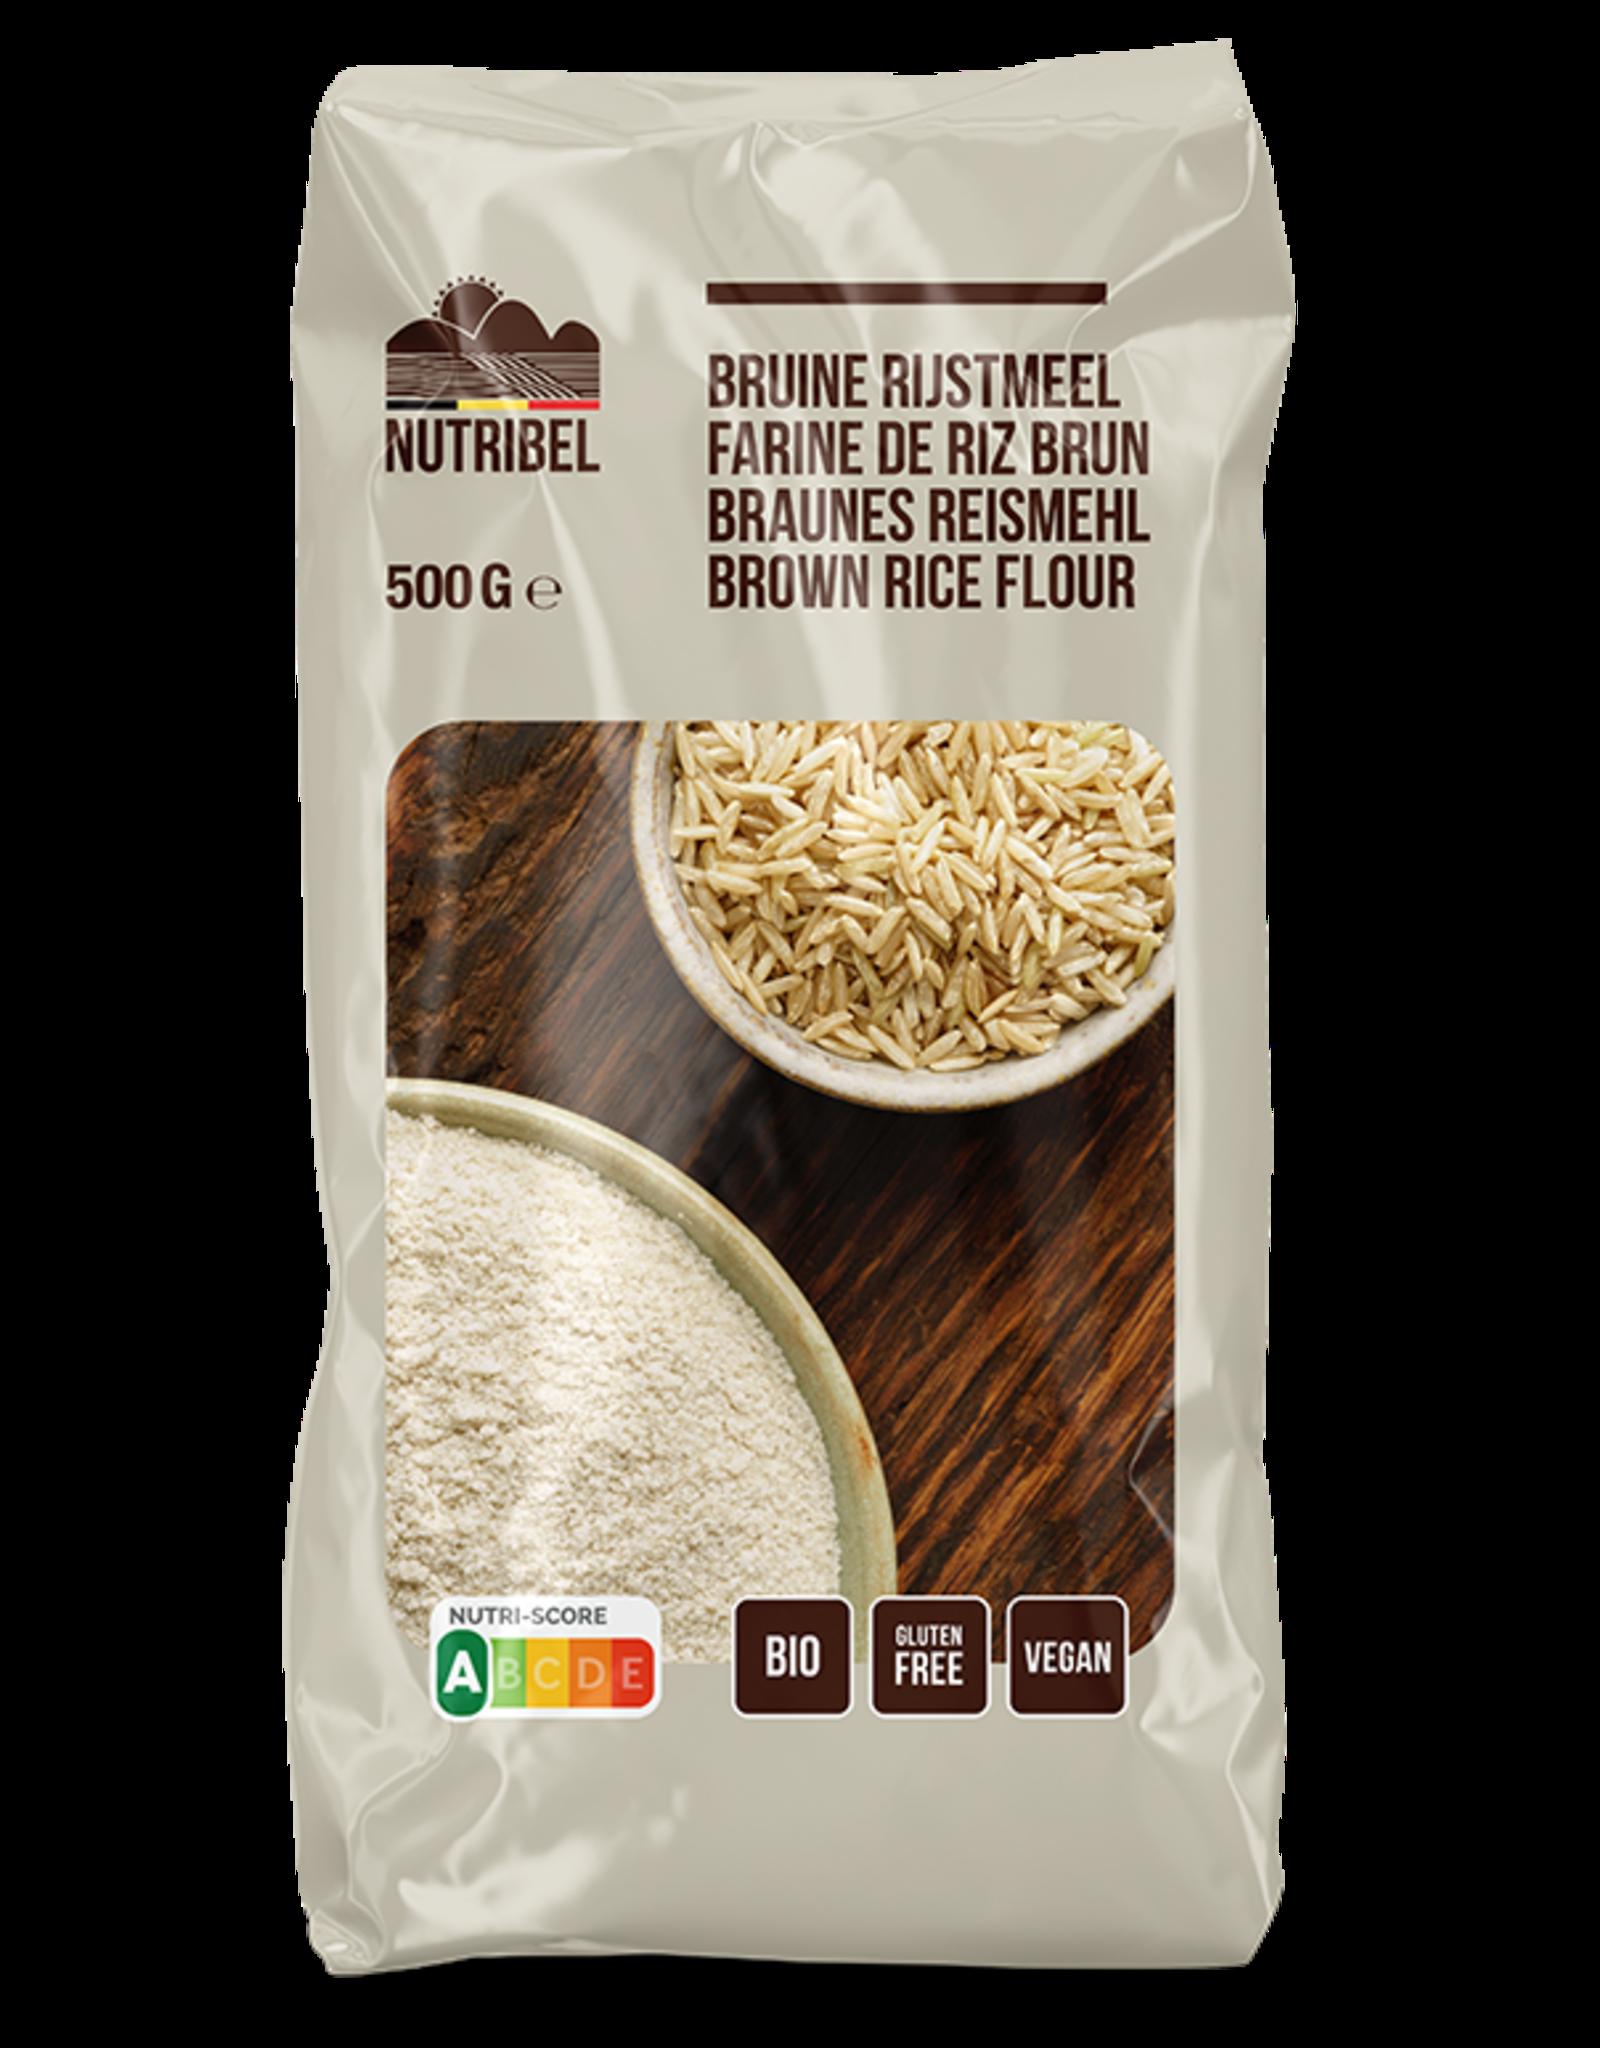 Nutribel Farine de riz brun bio & sans gluten 500g